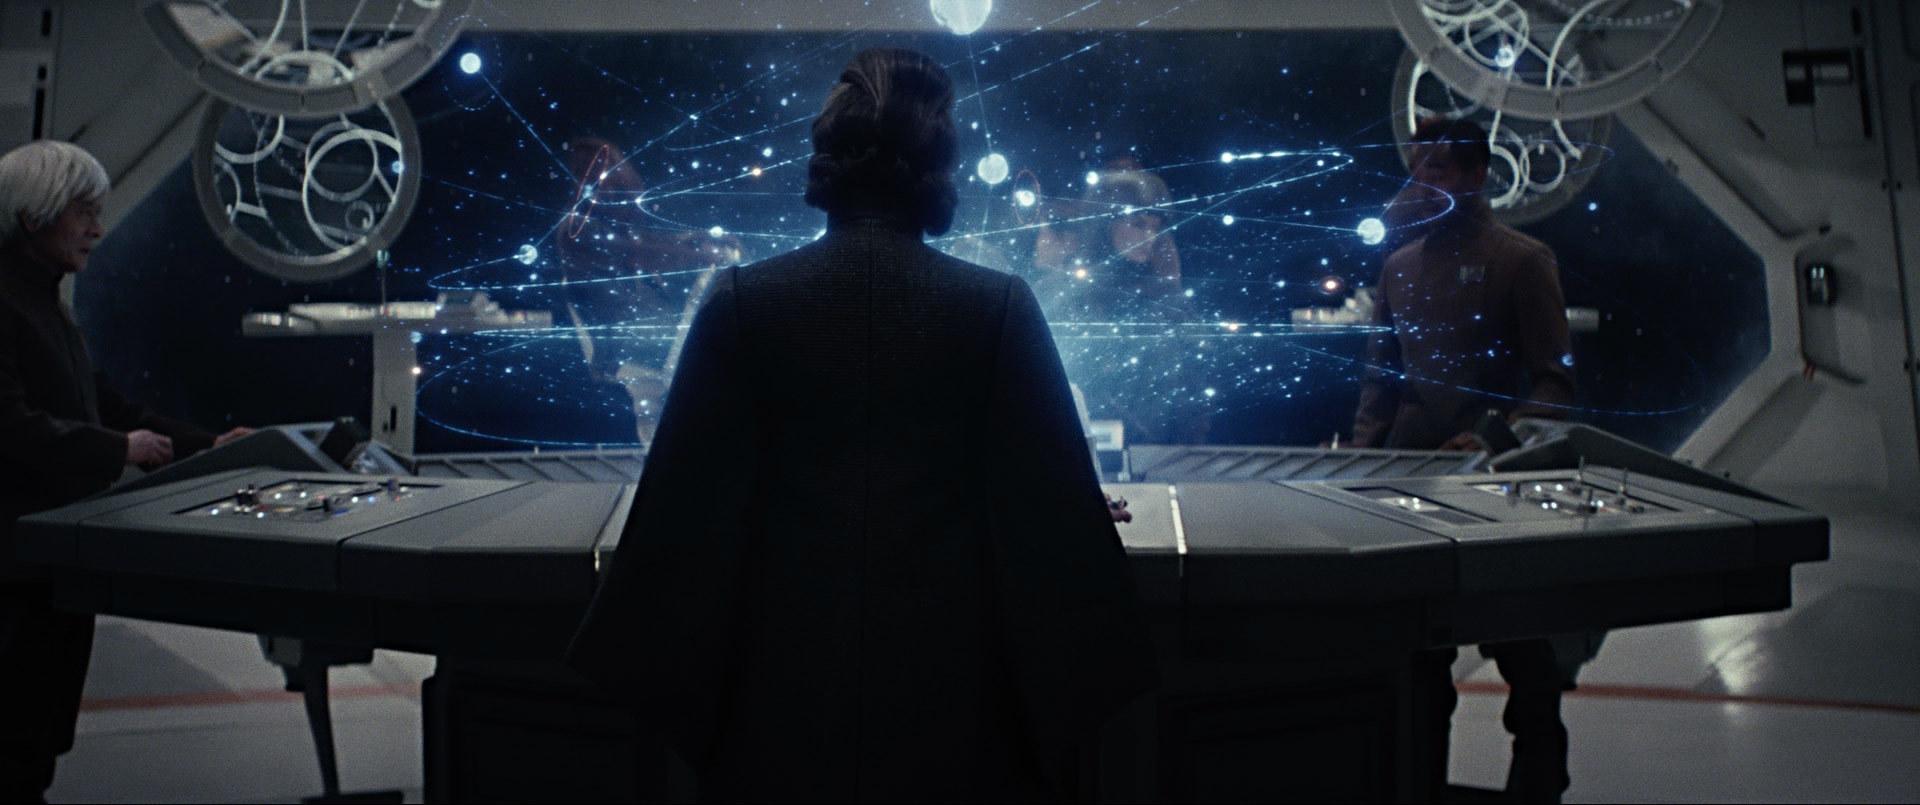 star-wars-the-last-jedi-review-leia